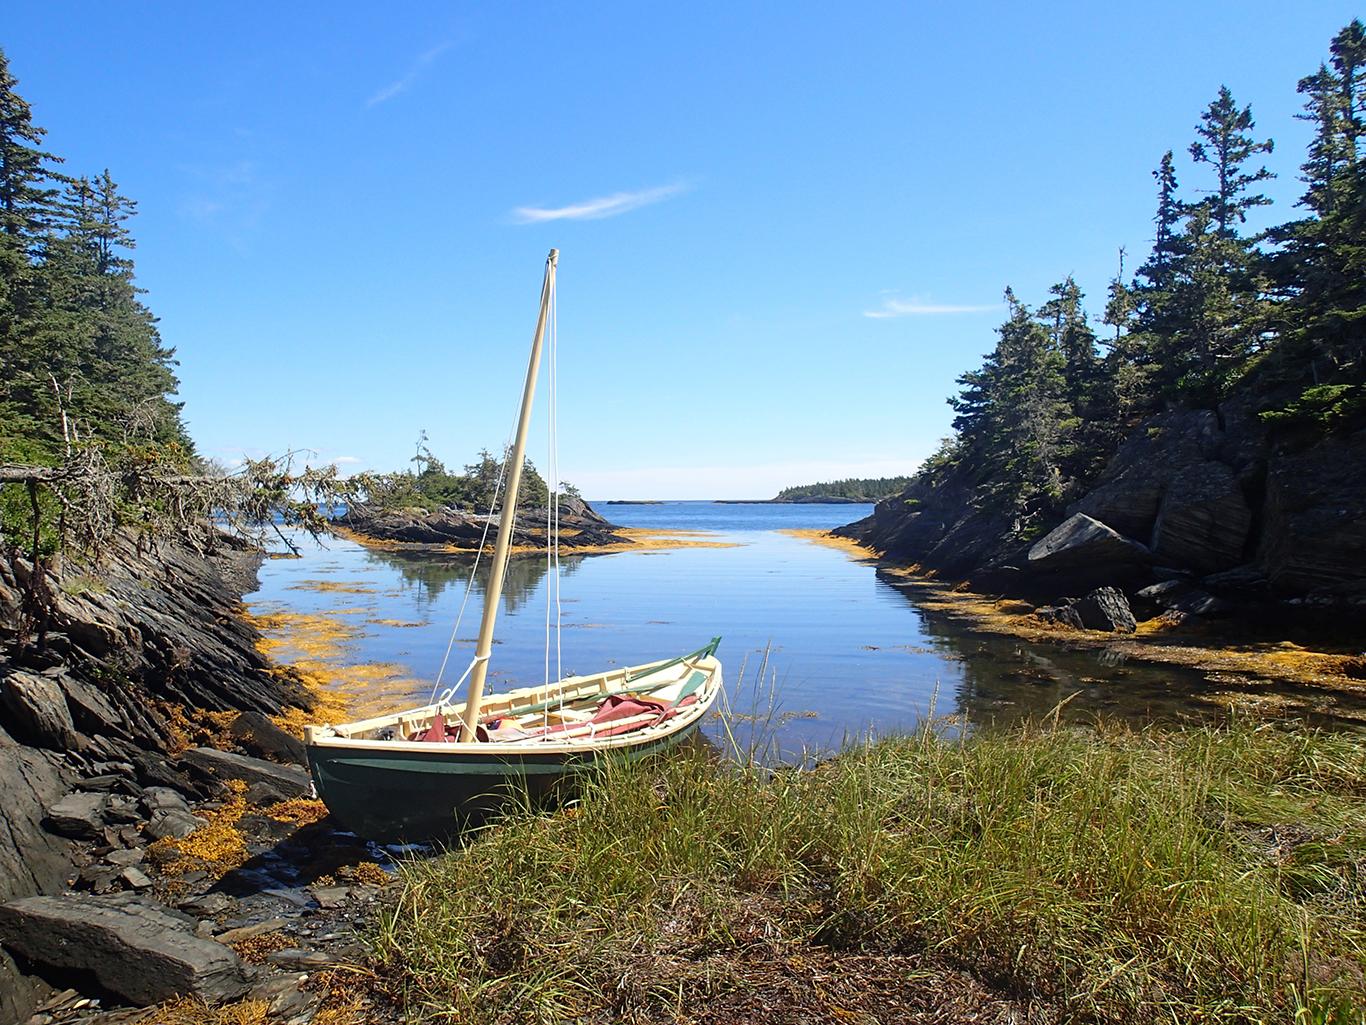 Natant Dory at home in Nova Scotia